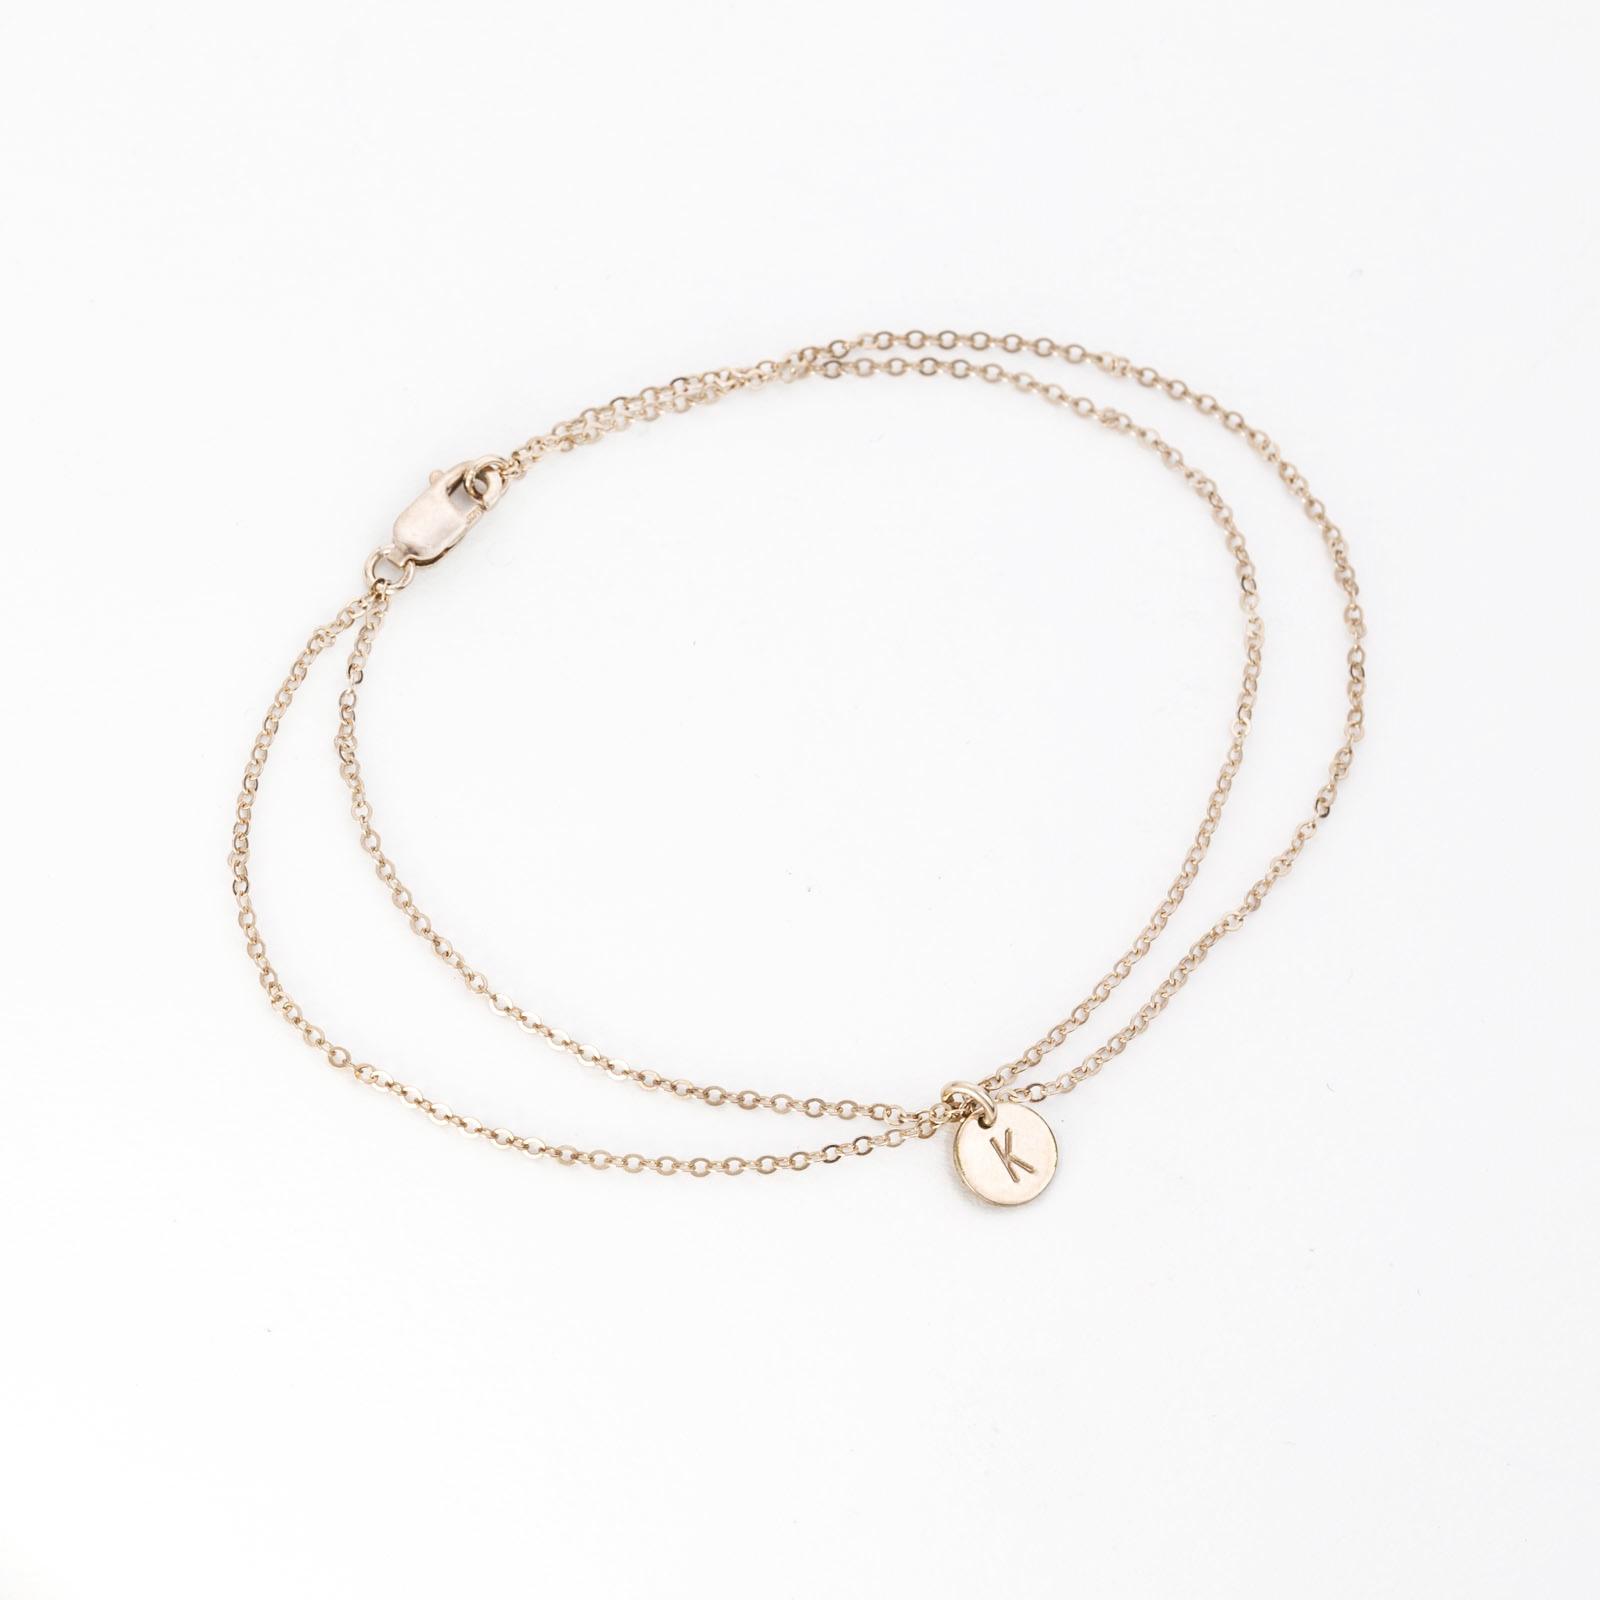 Dainty Double Wrap Initial Bracelet